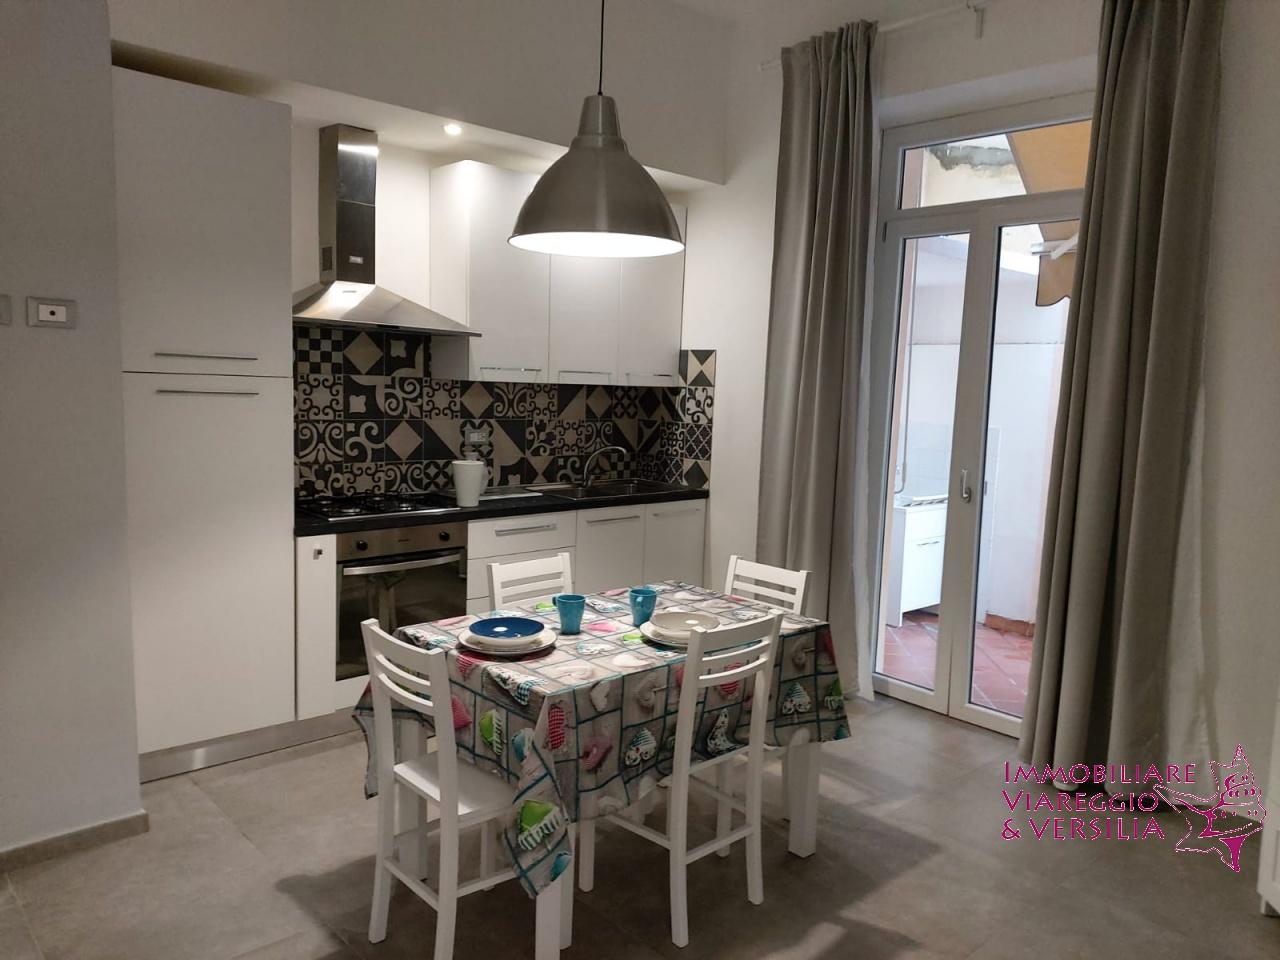 Appartamento VIAREGGIO V468